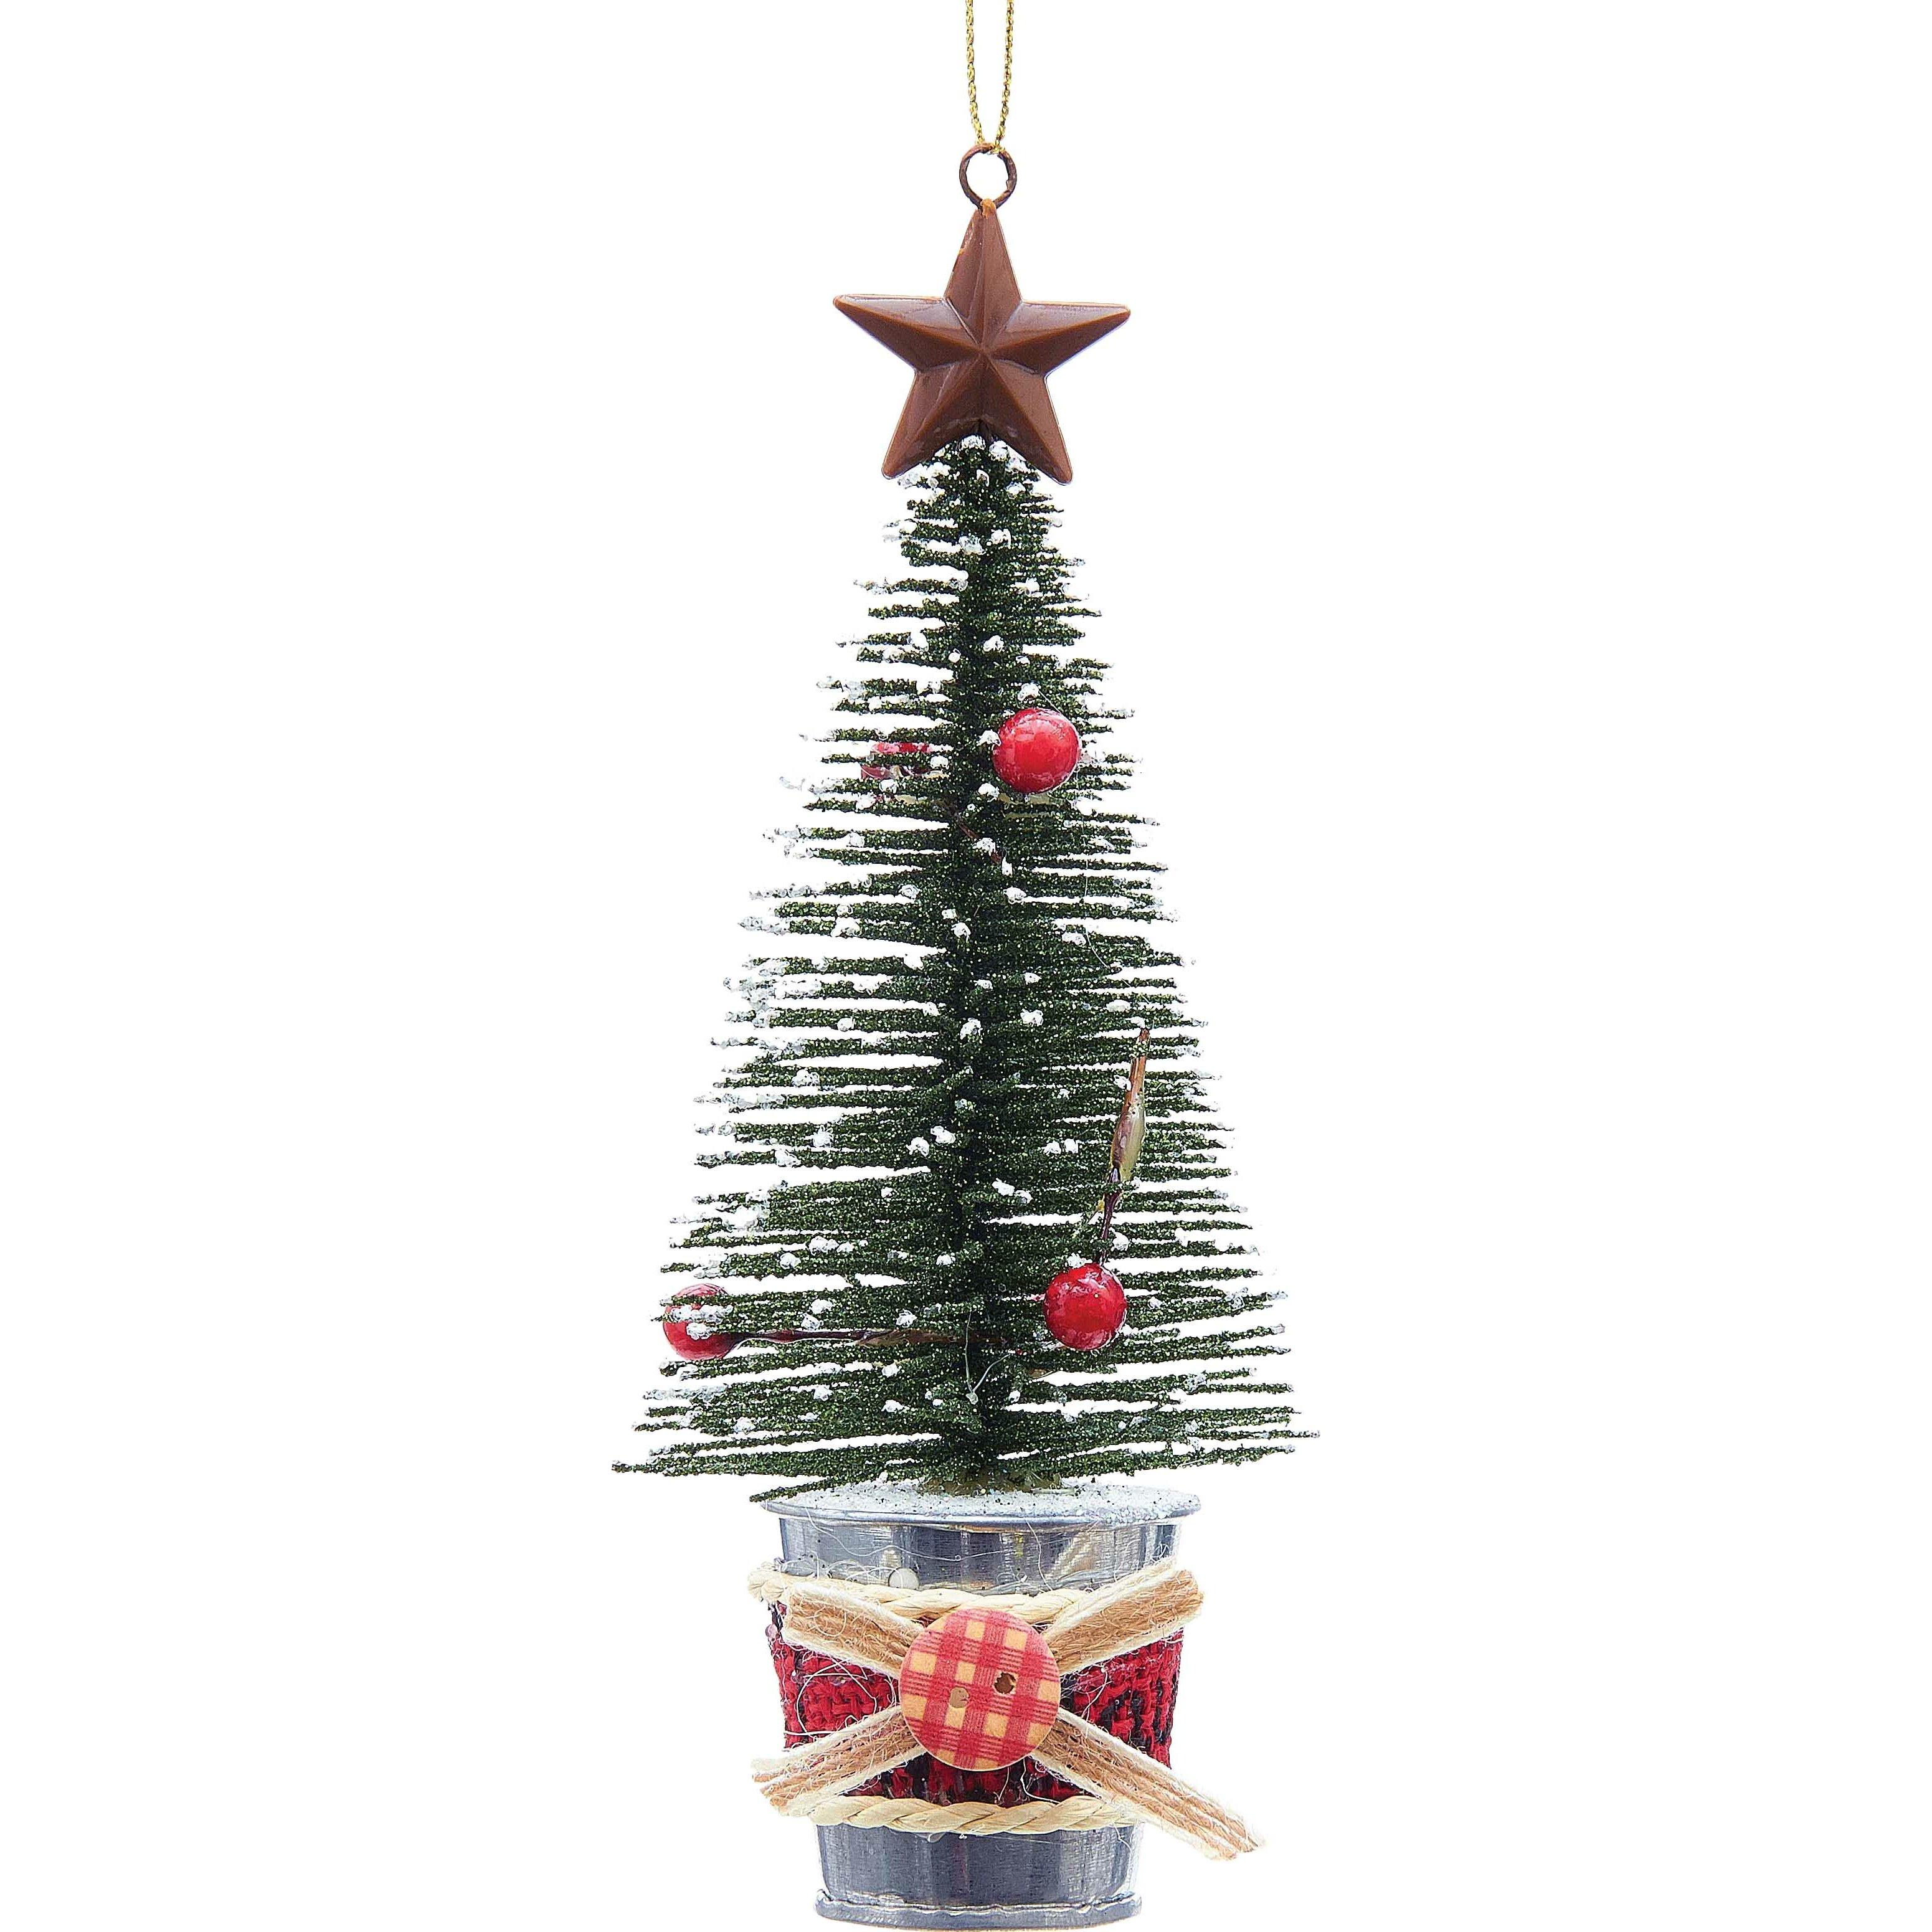 Best plastic christmas tree ornaments